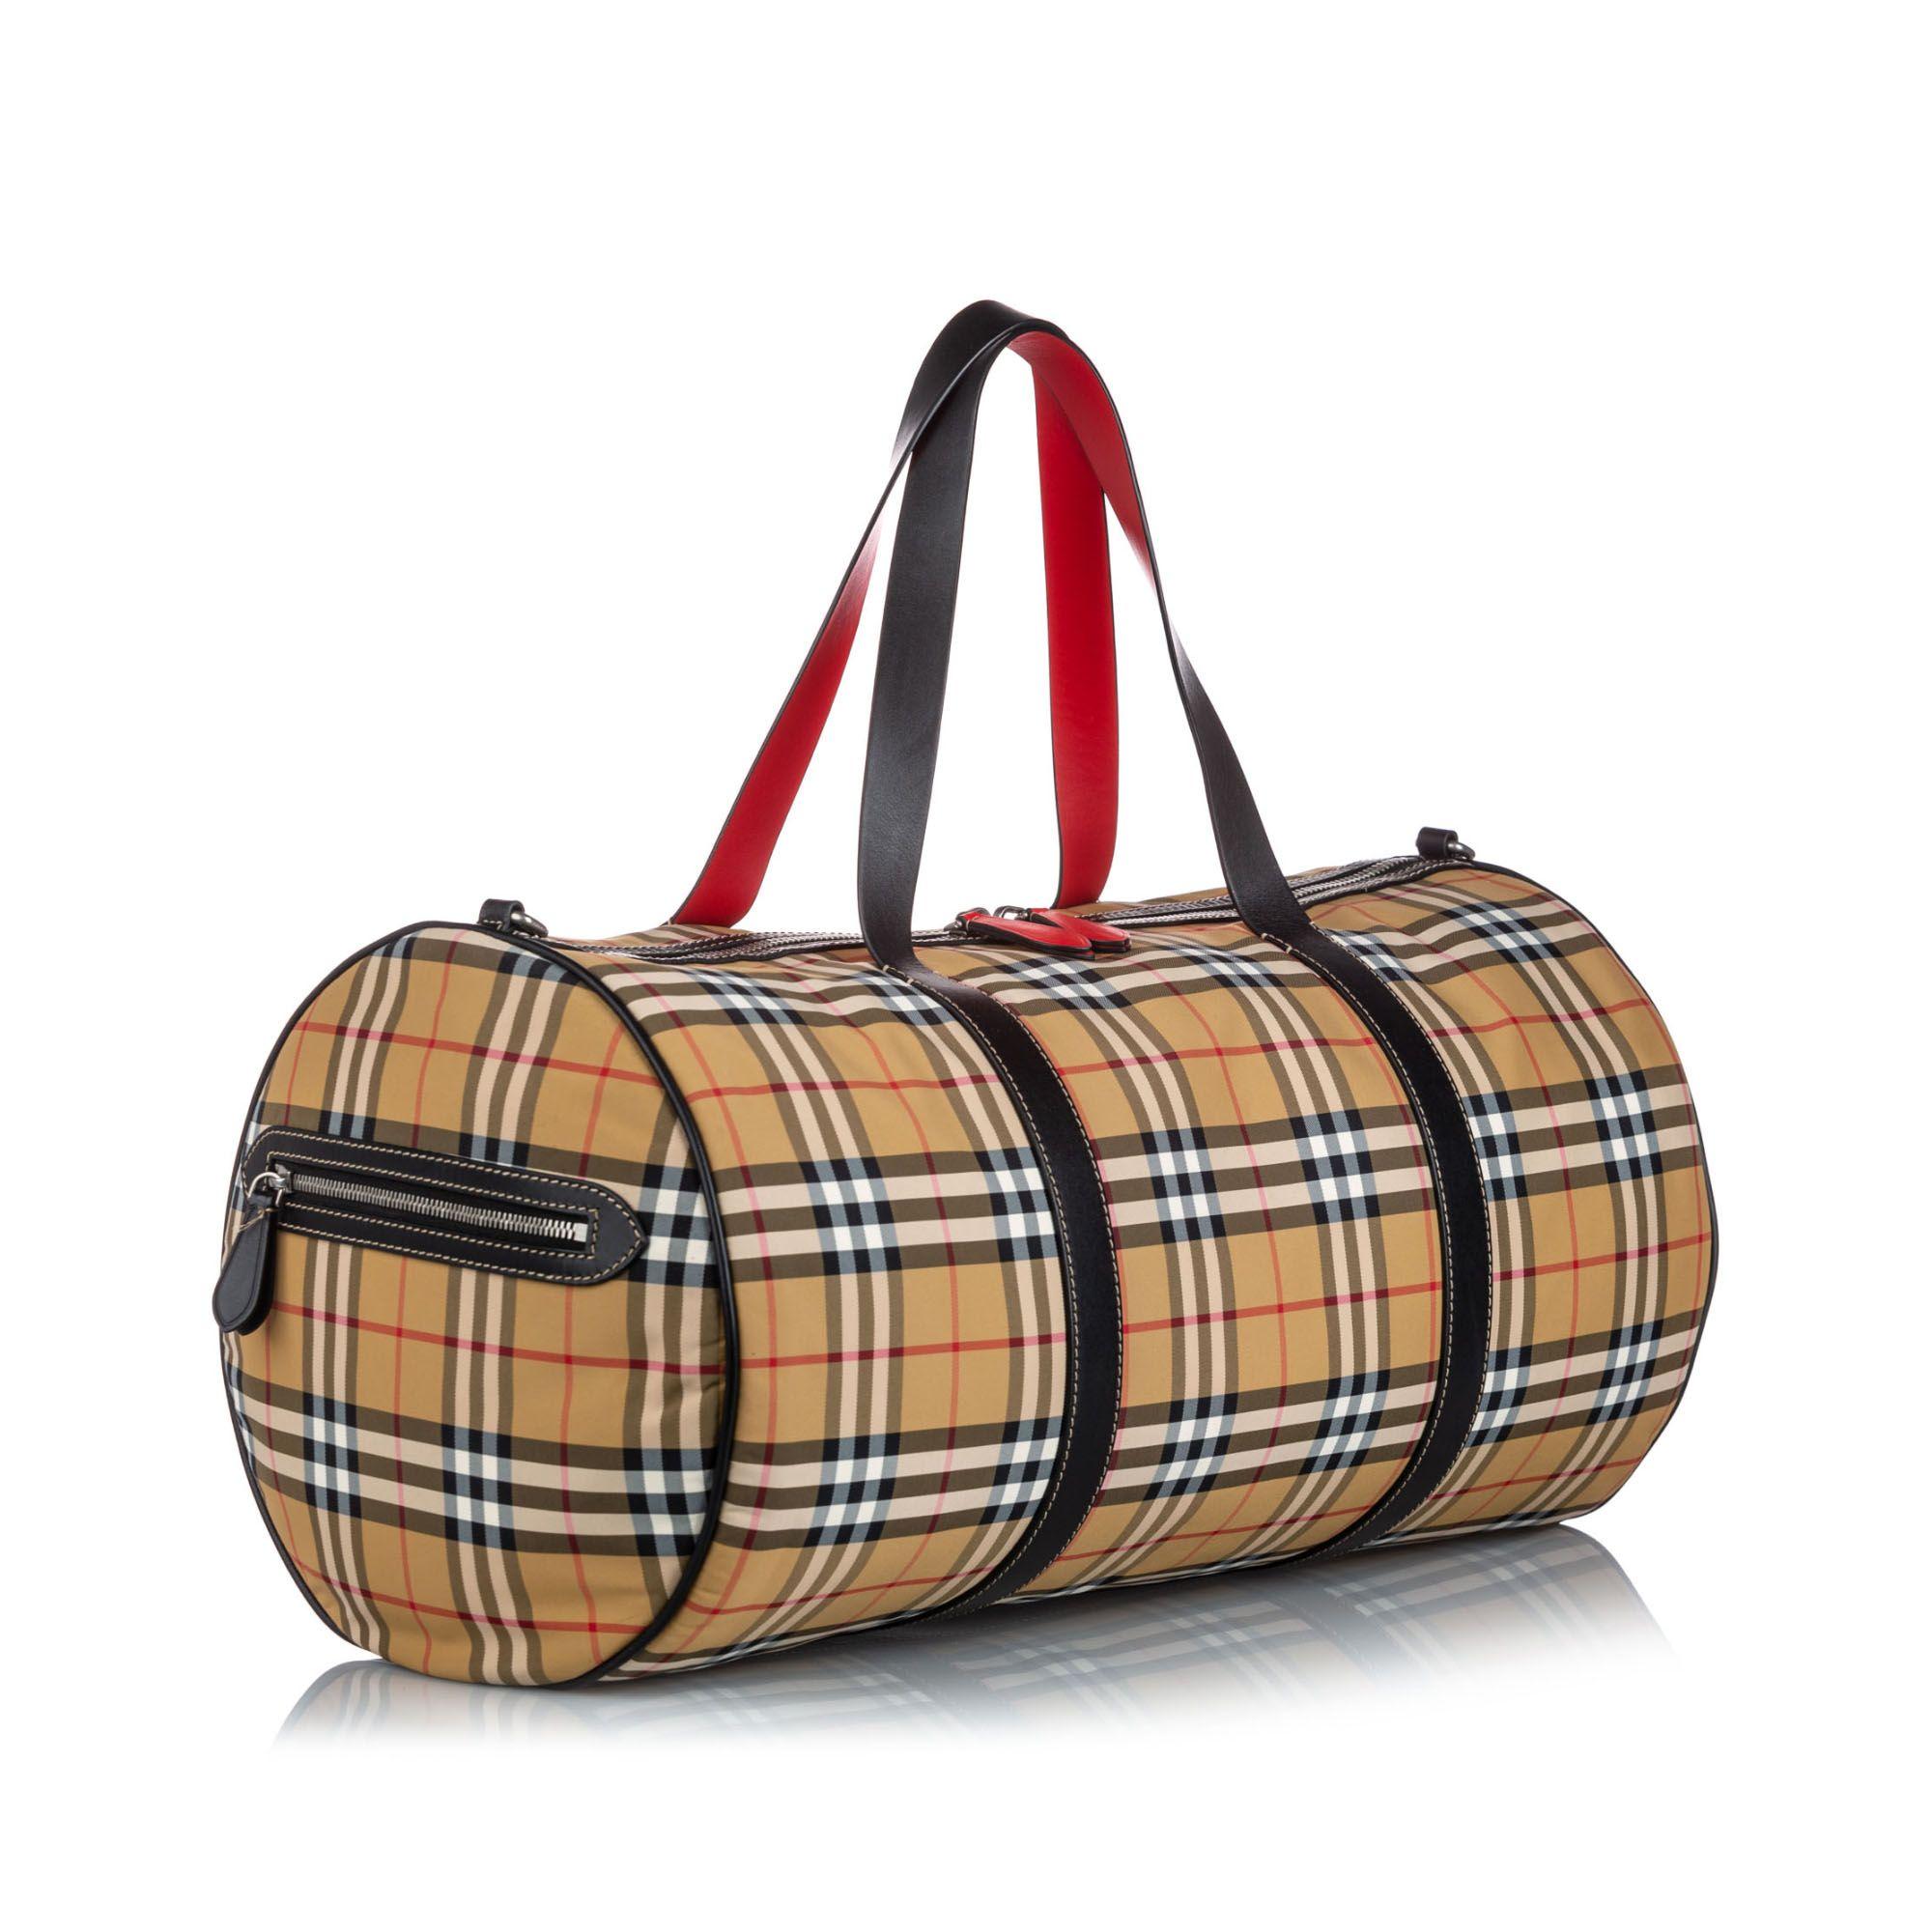 Vintage Burberry House Check Canvas Barrel Bag Brown